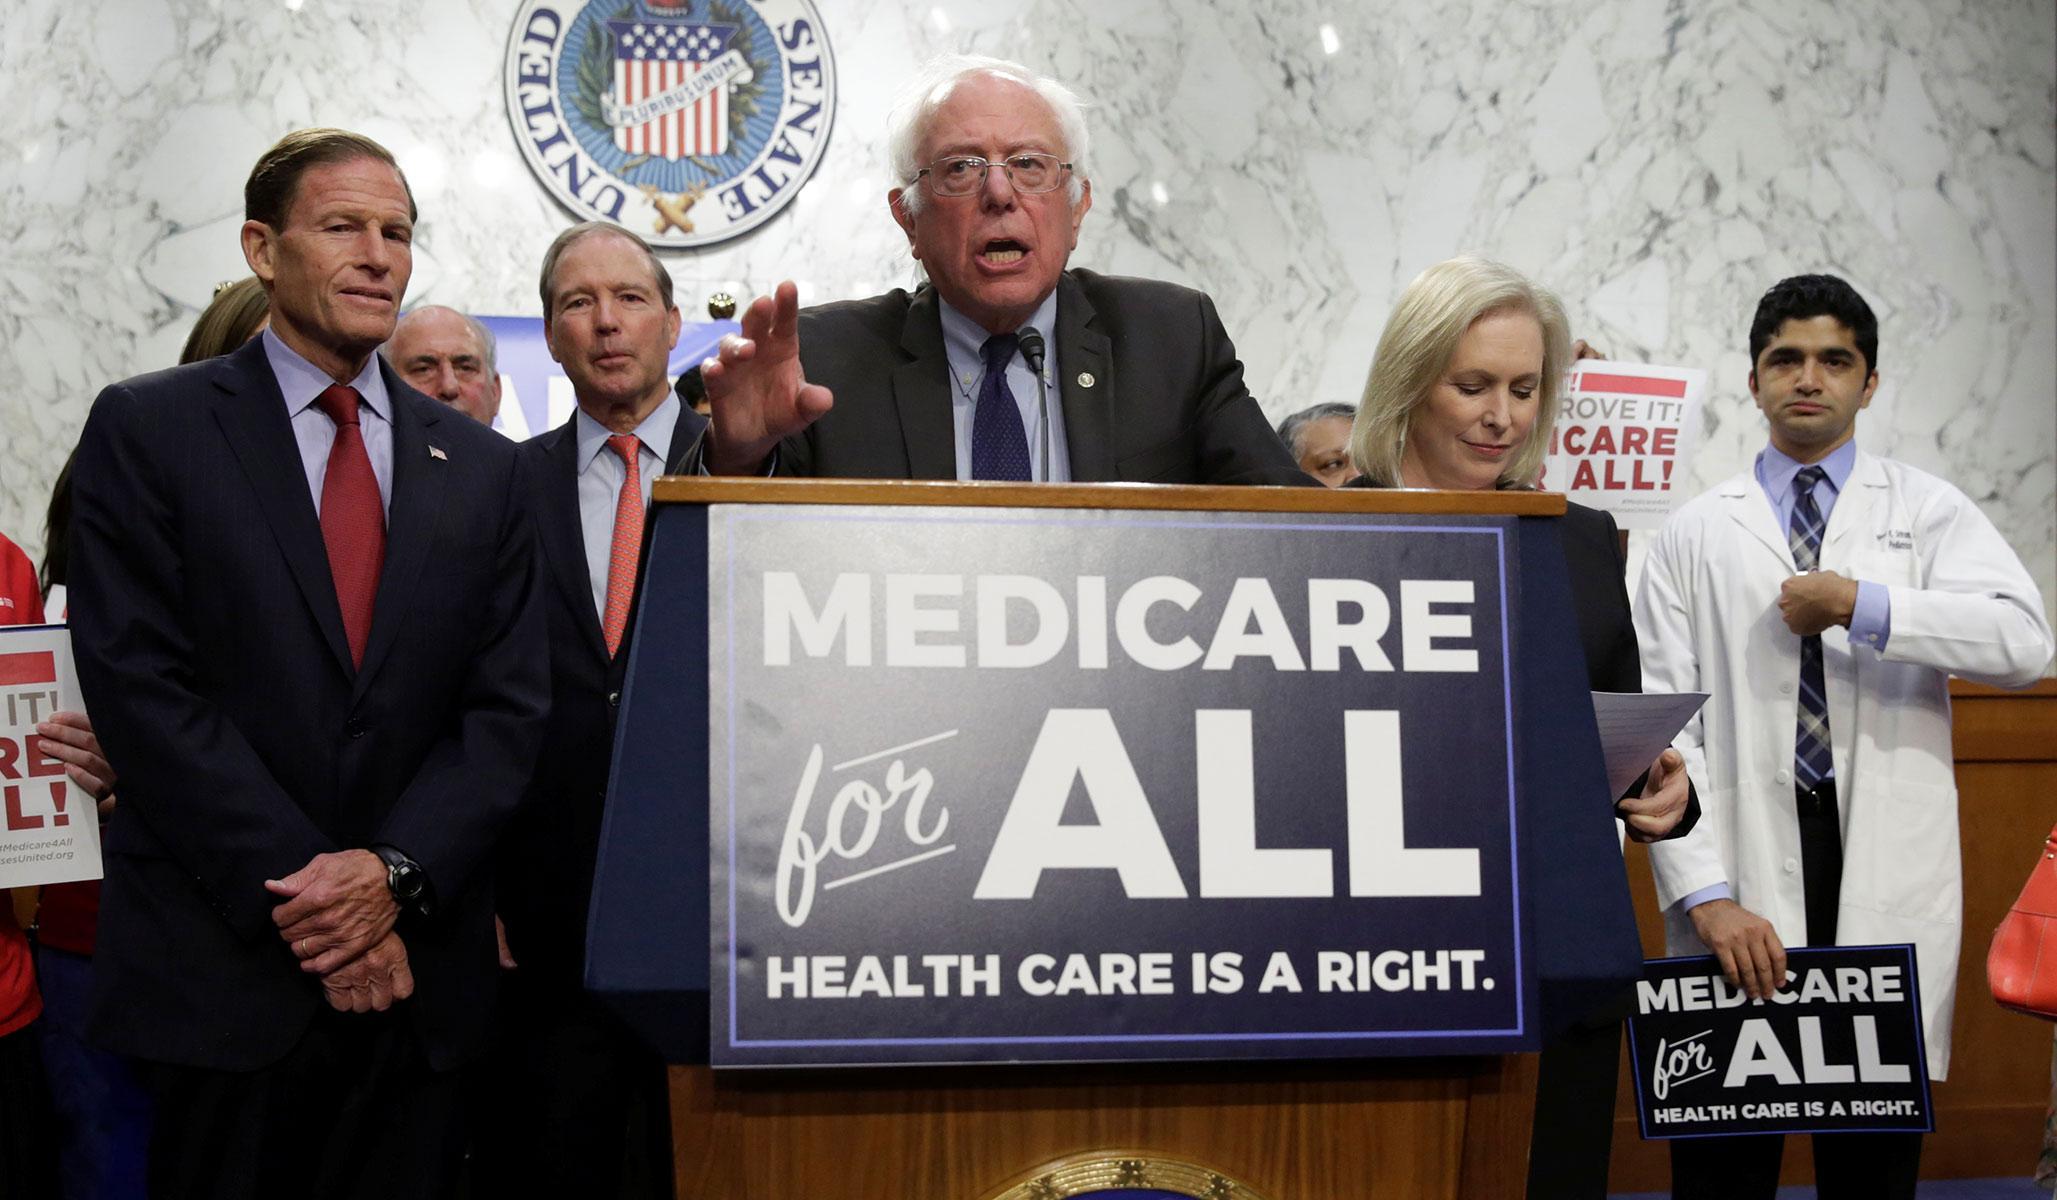 single-payer healthcare, bernie sanders